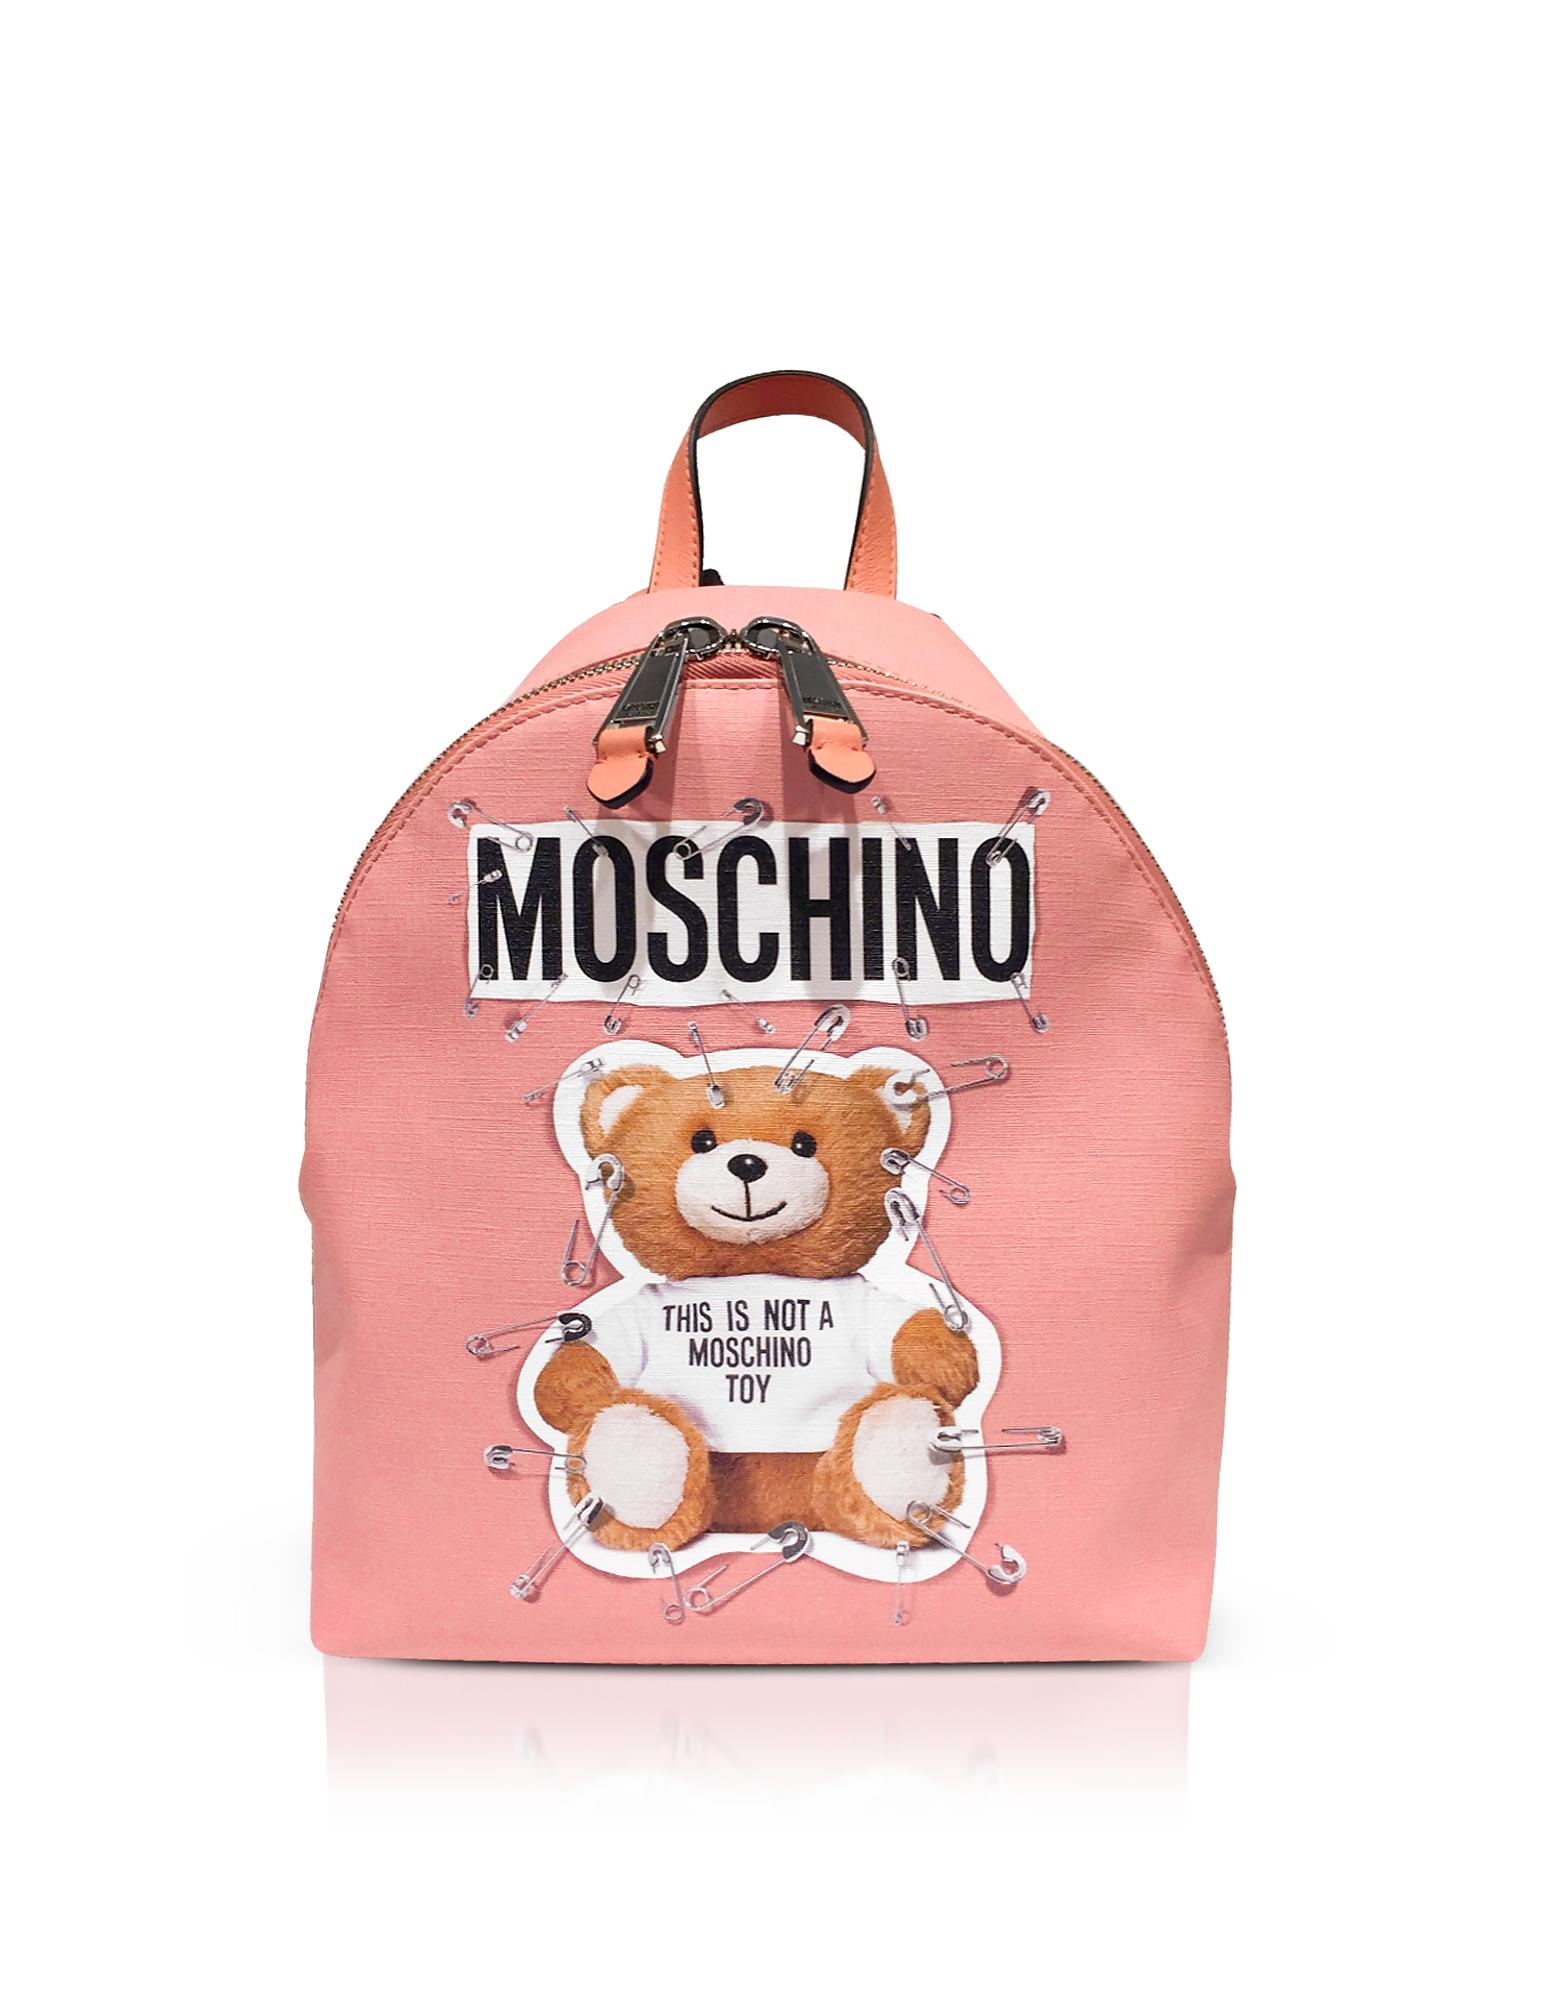 Moschino Handbags, Teddy Bear Pink Backpack